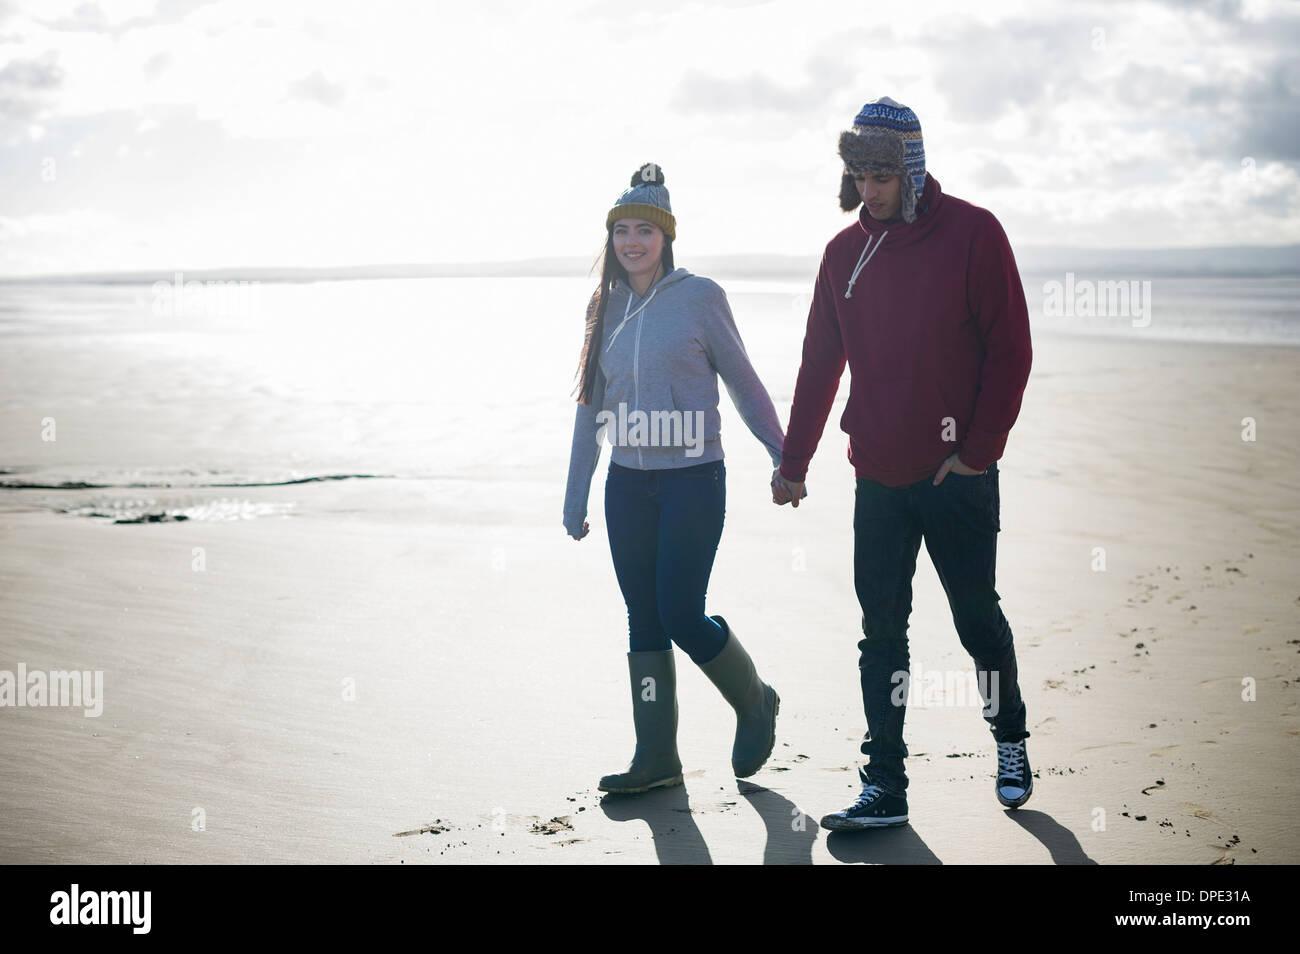 Junges Paar zu Fuß am Strand, Brean Sands, Somerset, England Stockbild